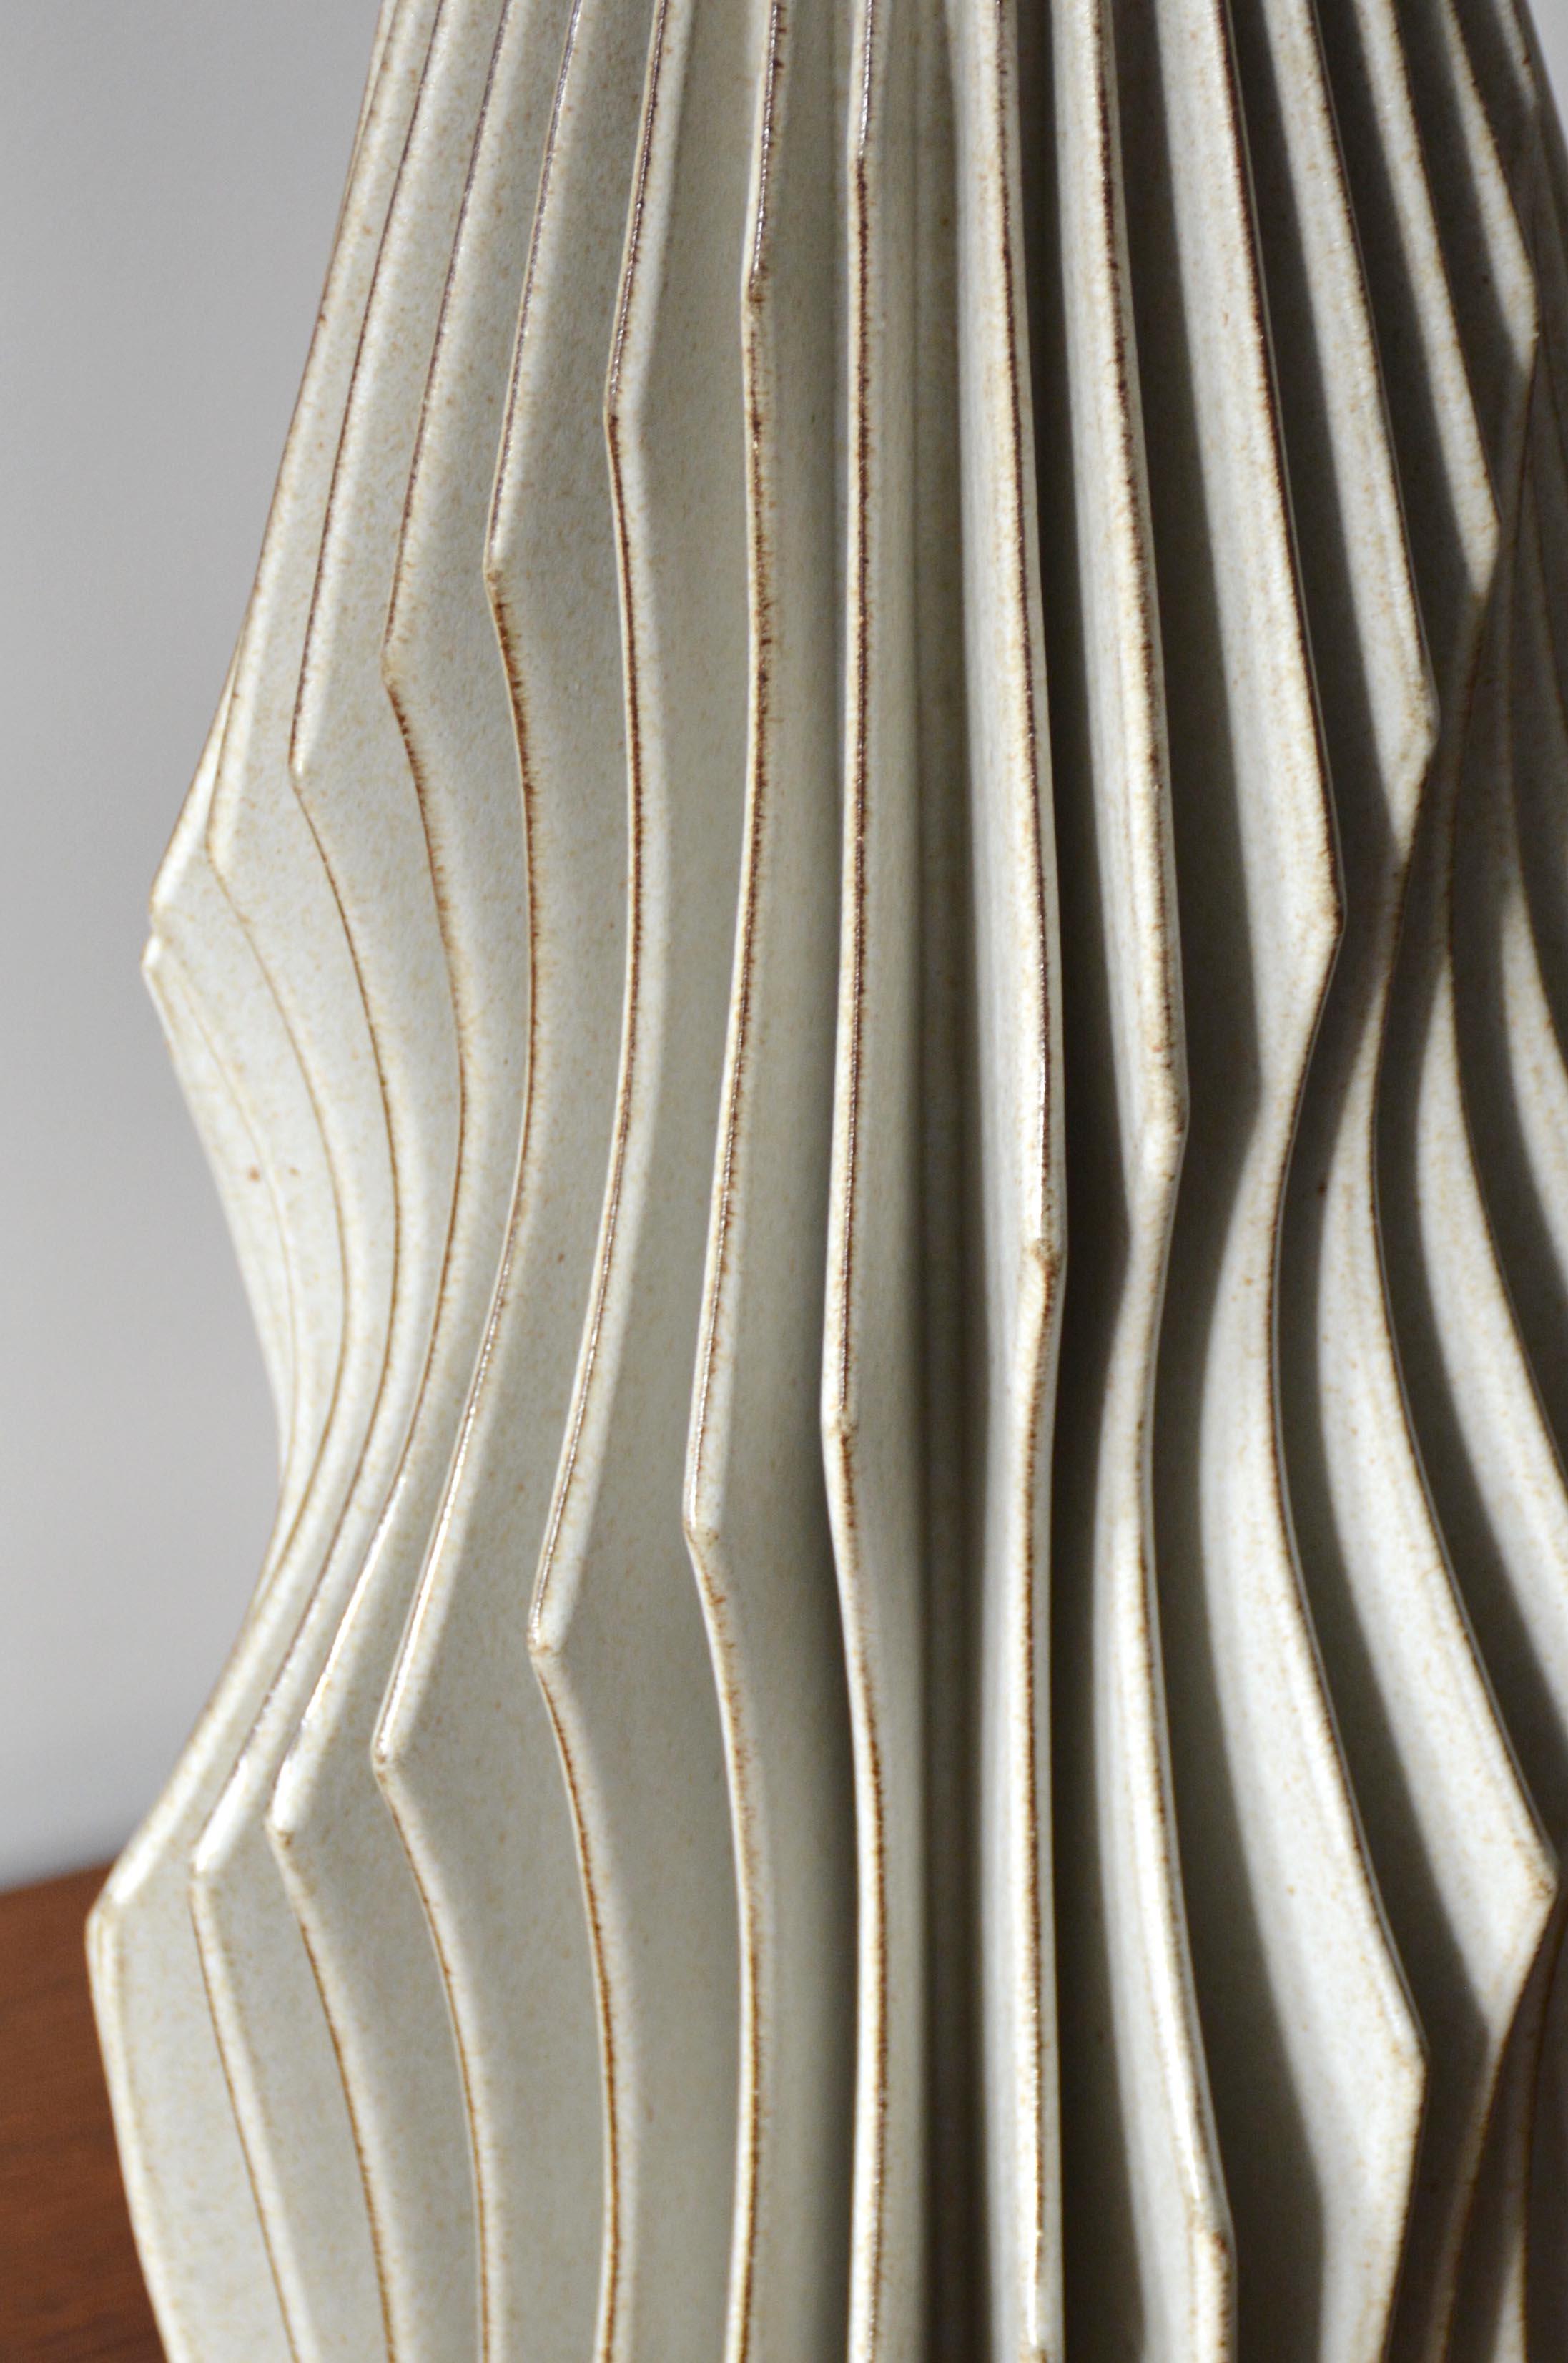 Scalloped Spiral Detail (0599)